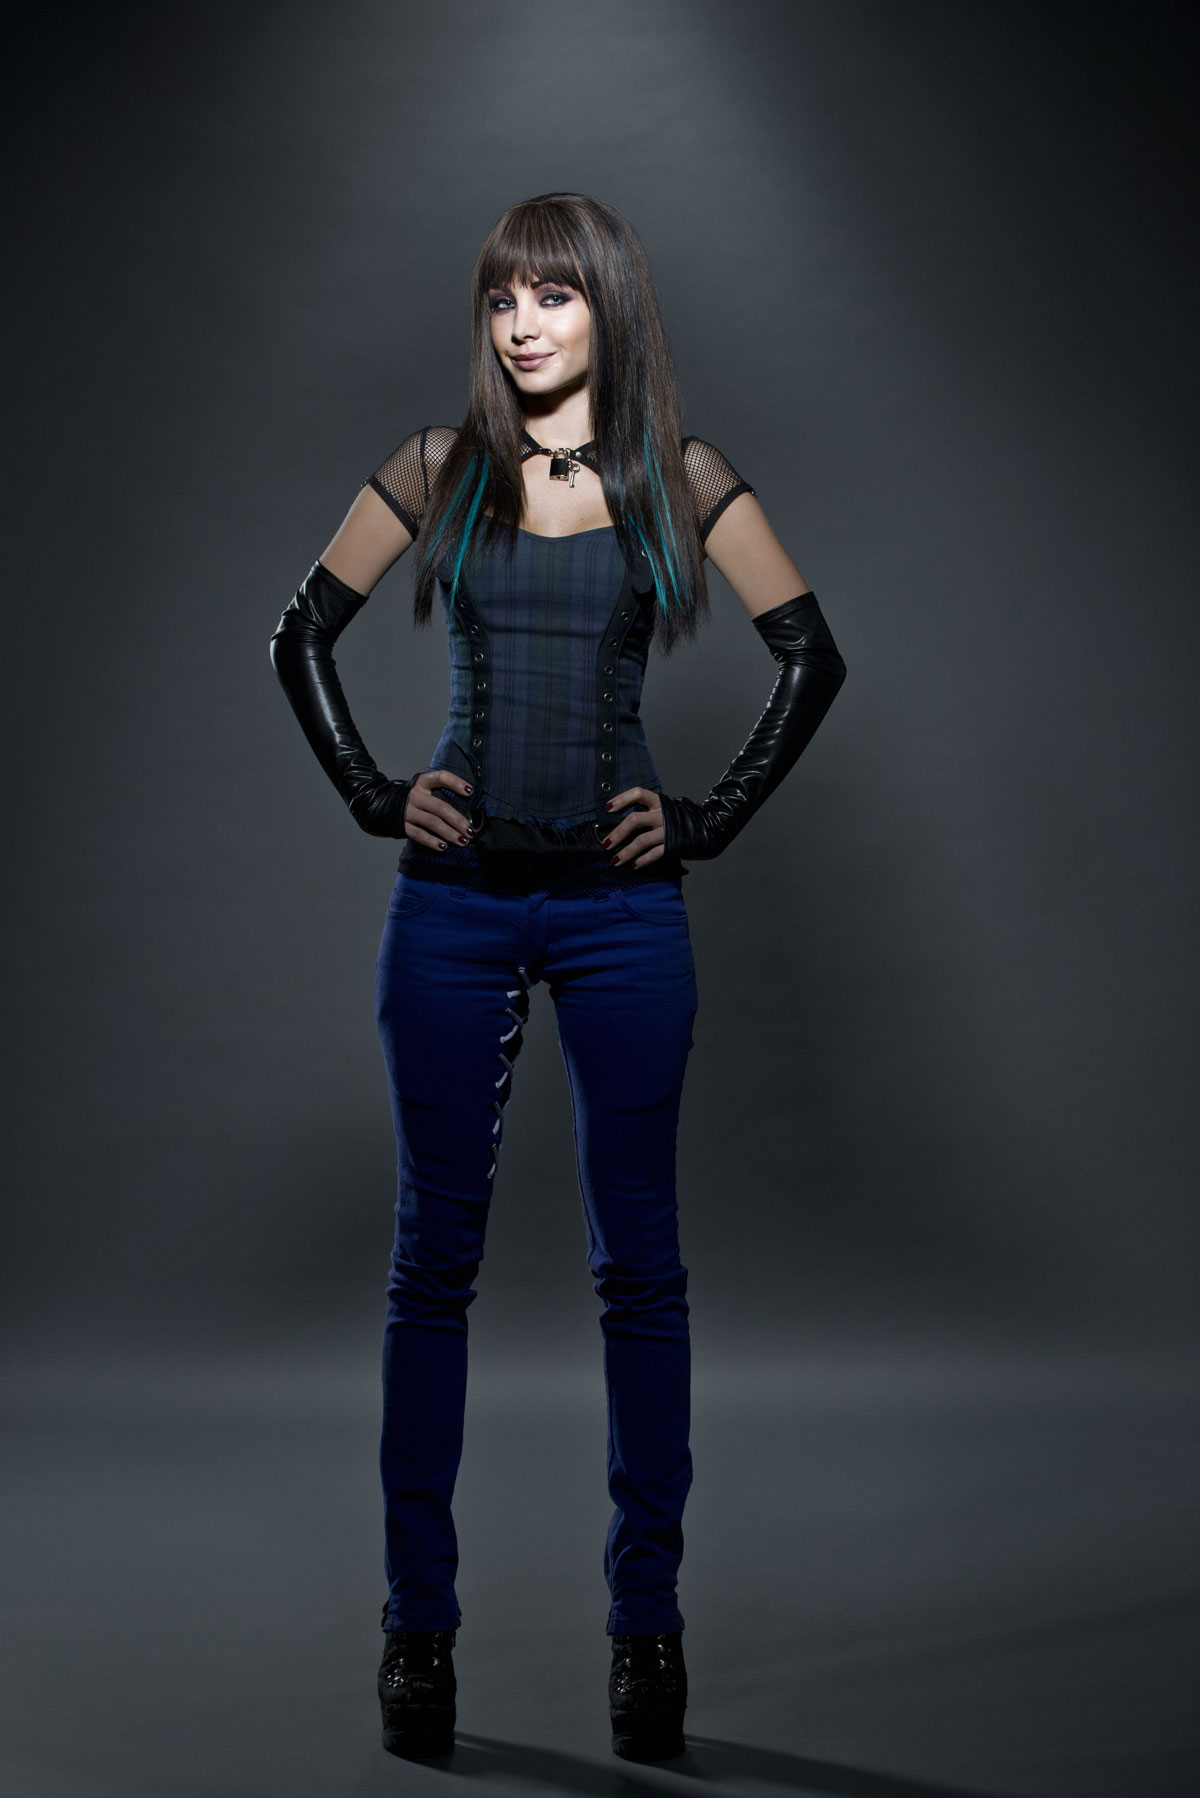 Ksenia Solo Lost Girl Season 4 promoshoot